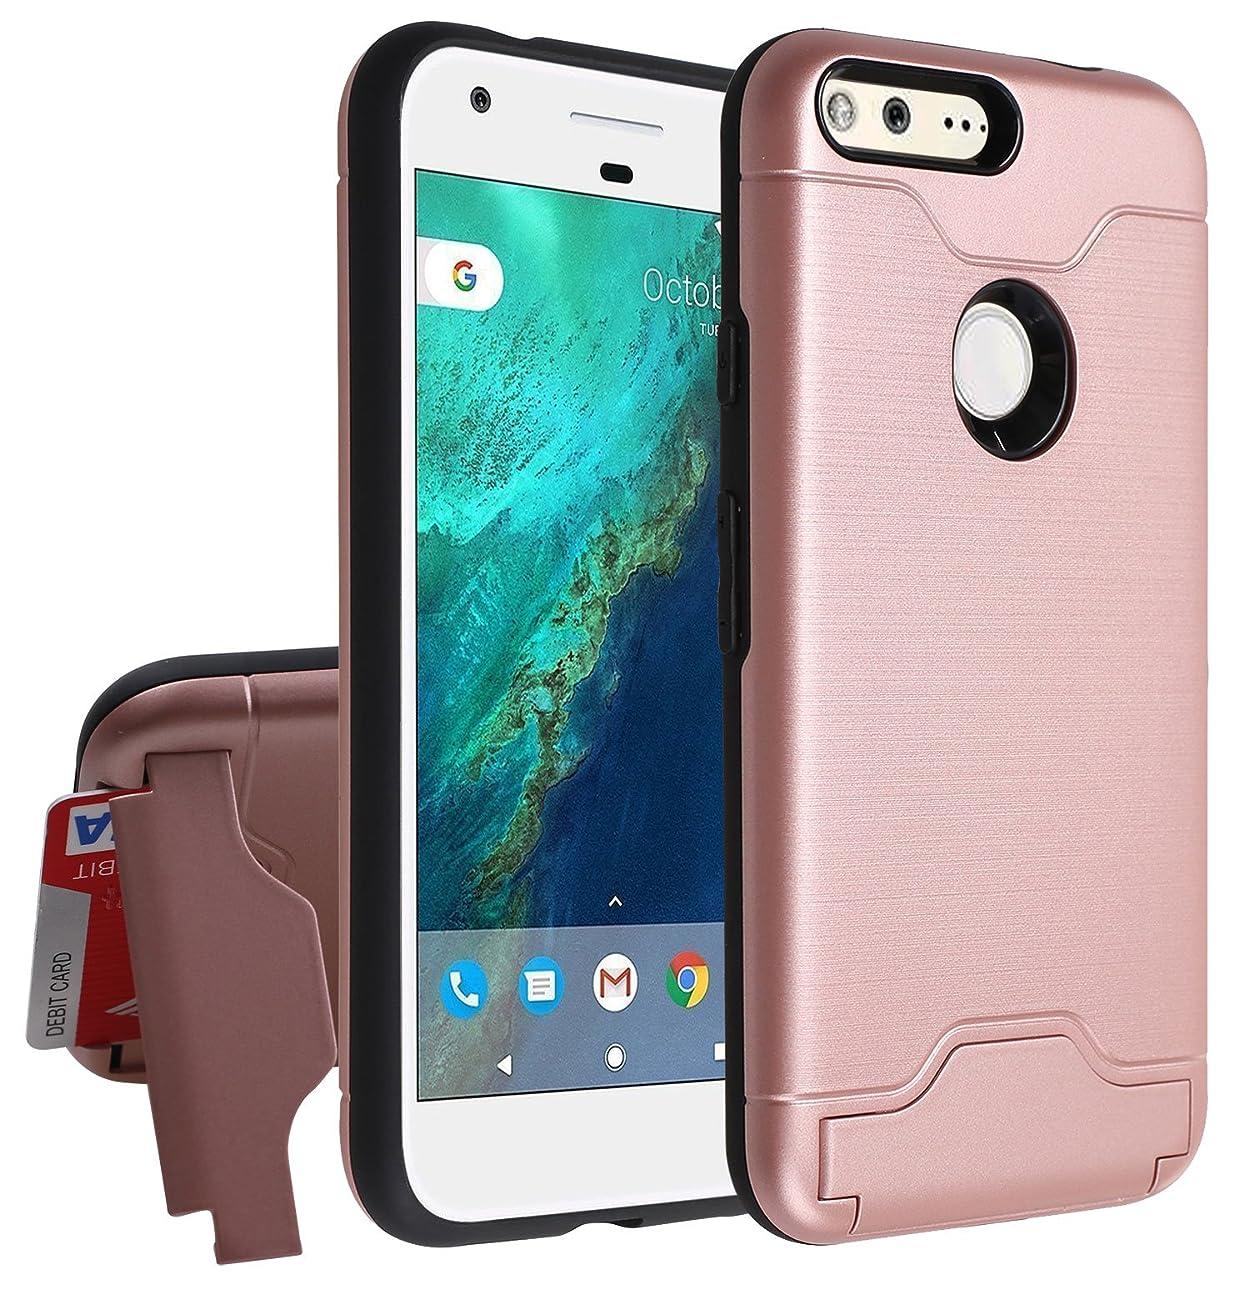 Google Pixel XL Wallet Case,[Hidden Card Slot Kickstand] Dual Layer Shock Absorption Protective Case [Credit Card Slot] Heavy Duty Bumper Case for Google Pixel XL (Rose Gold)